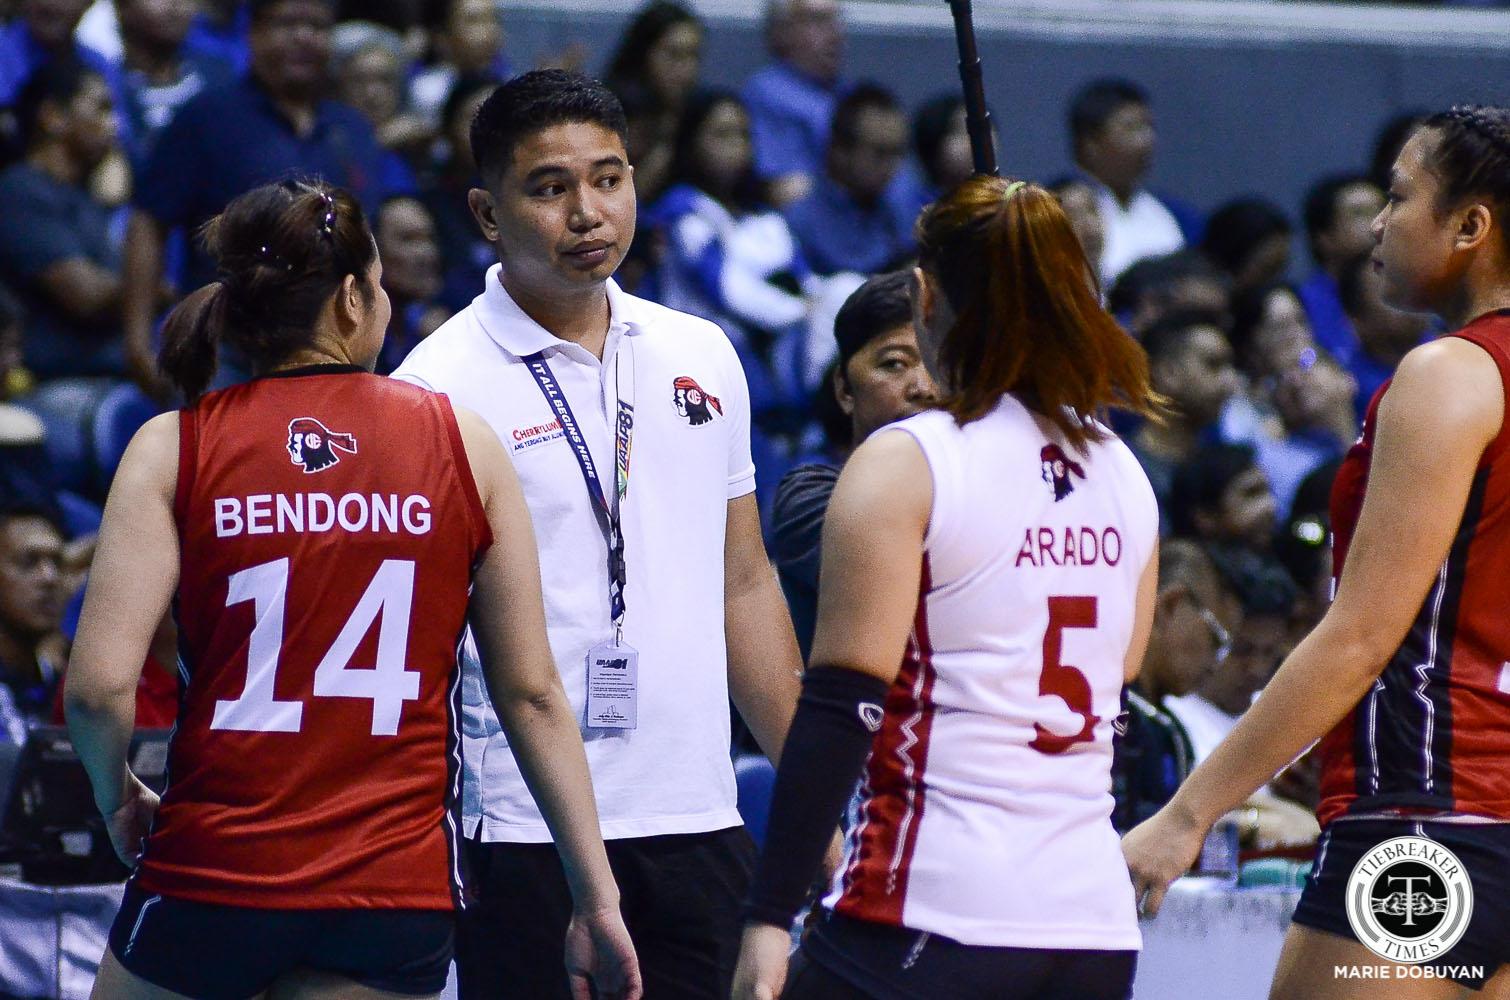 UAAP81_Women-Vball-ADMU-vs-UE-UE-Head-COach-0809 Judith Abil on UE Lady Warriors' woeful outing: 'Nawala lang talaga kumpiyansa namin' News UAAP UE Volleyball  - philippine sports news